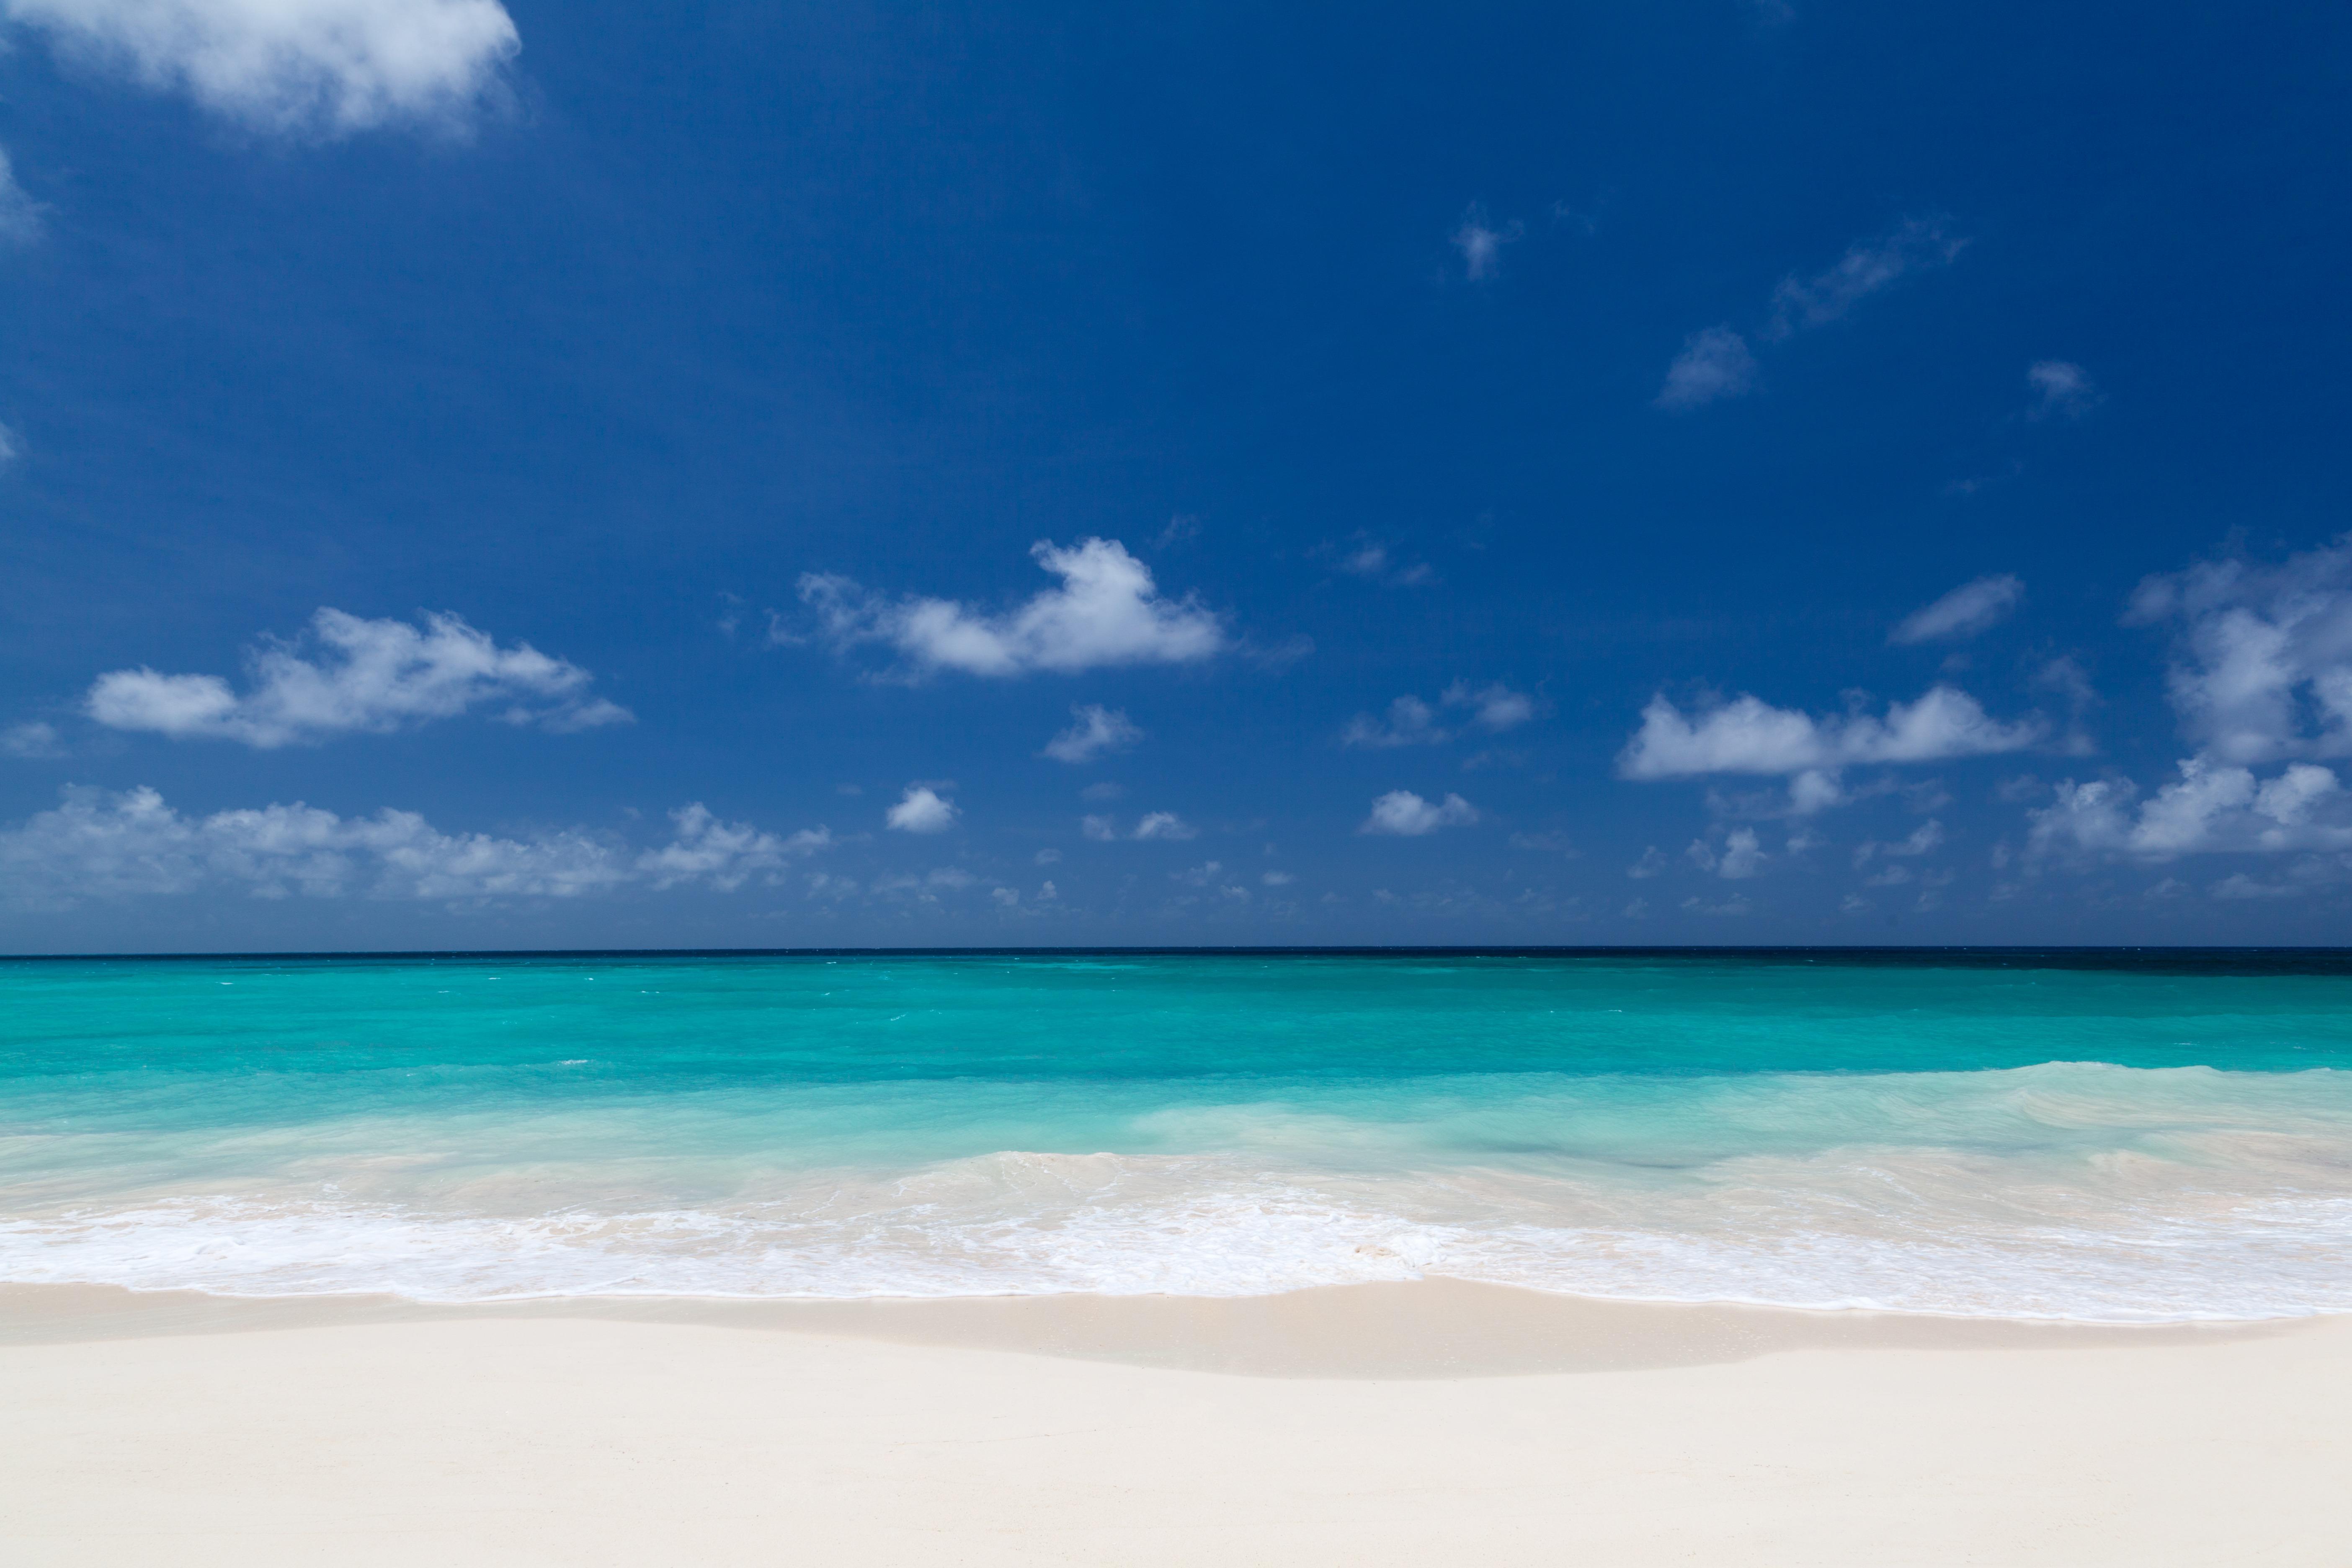 Free Images : Beach, Landscape, Sea, Coast, Nature, Sand